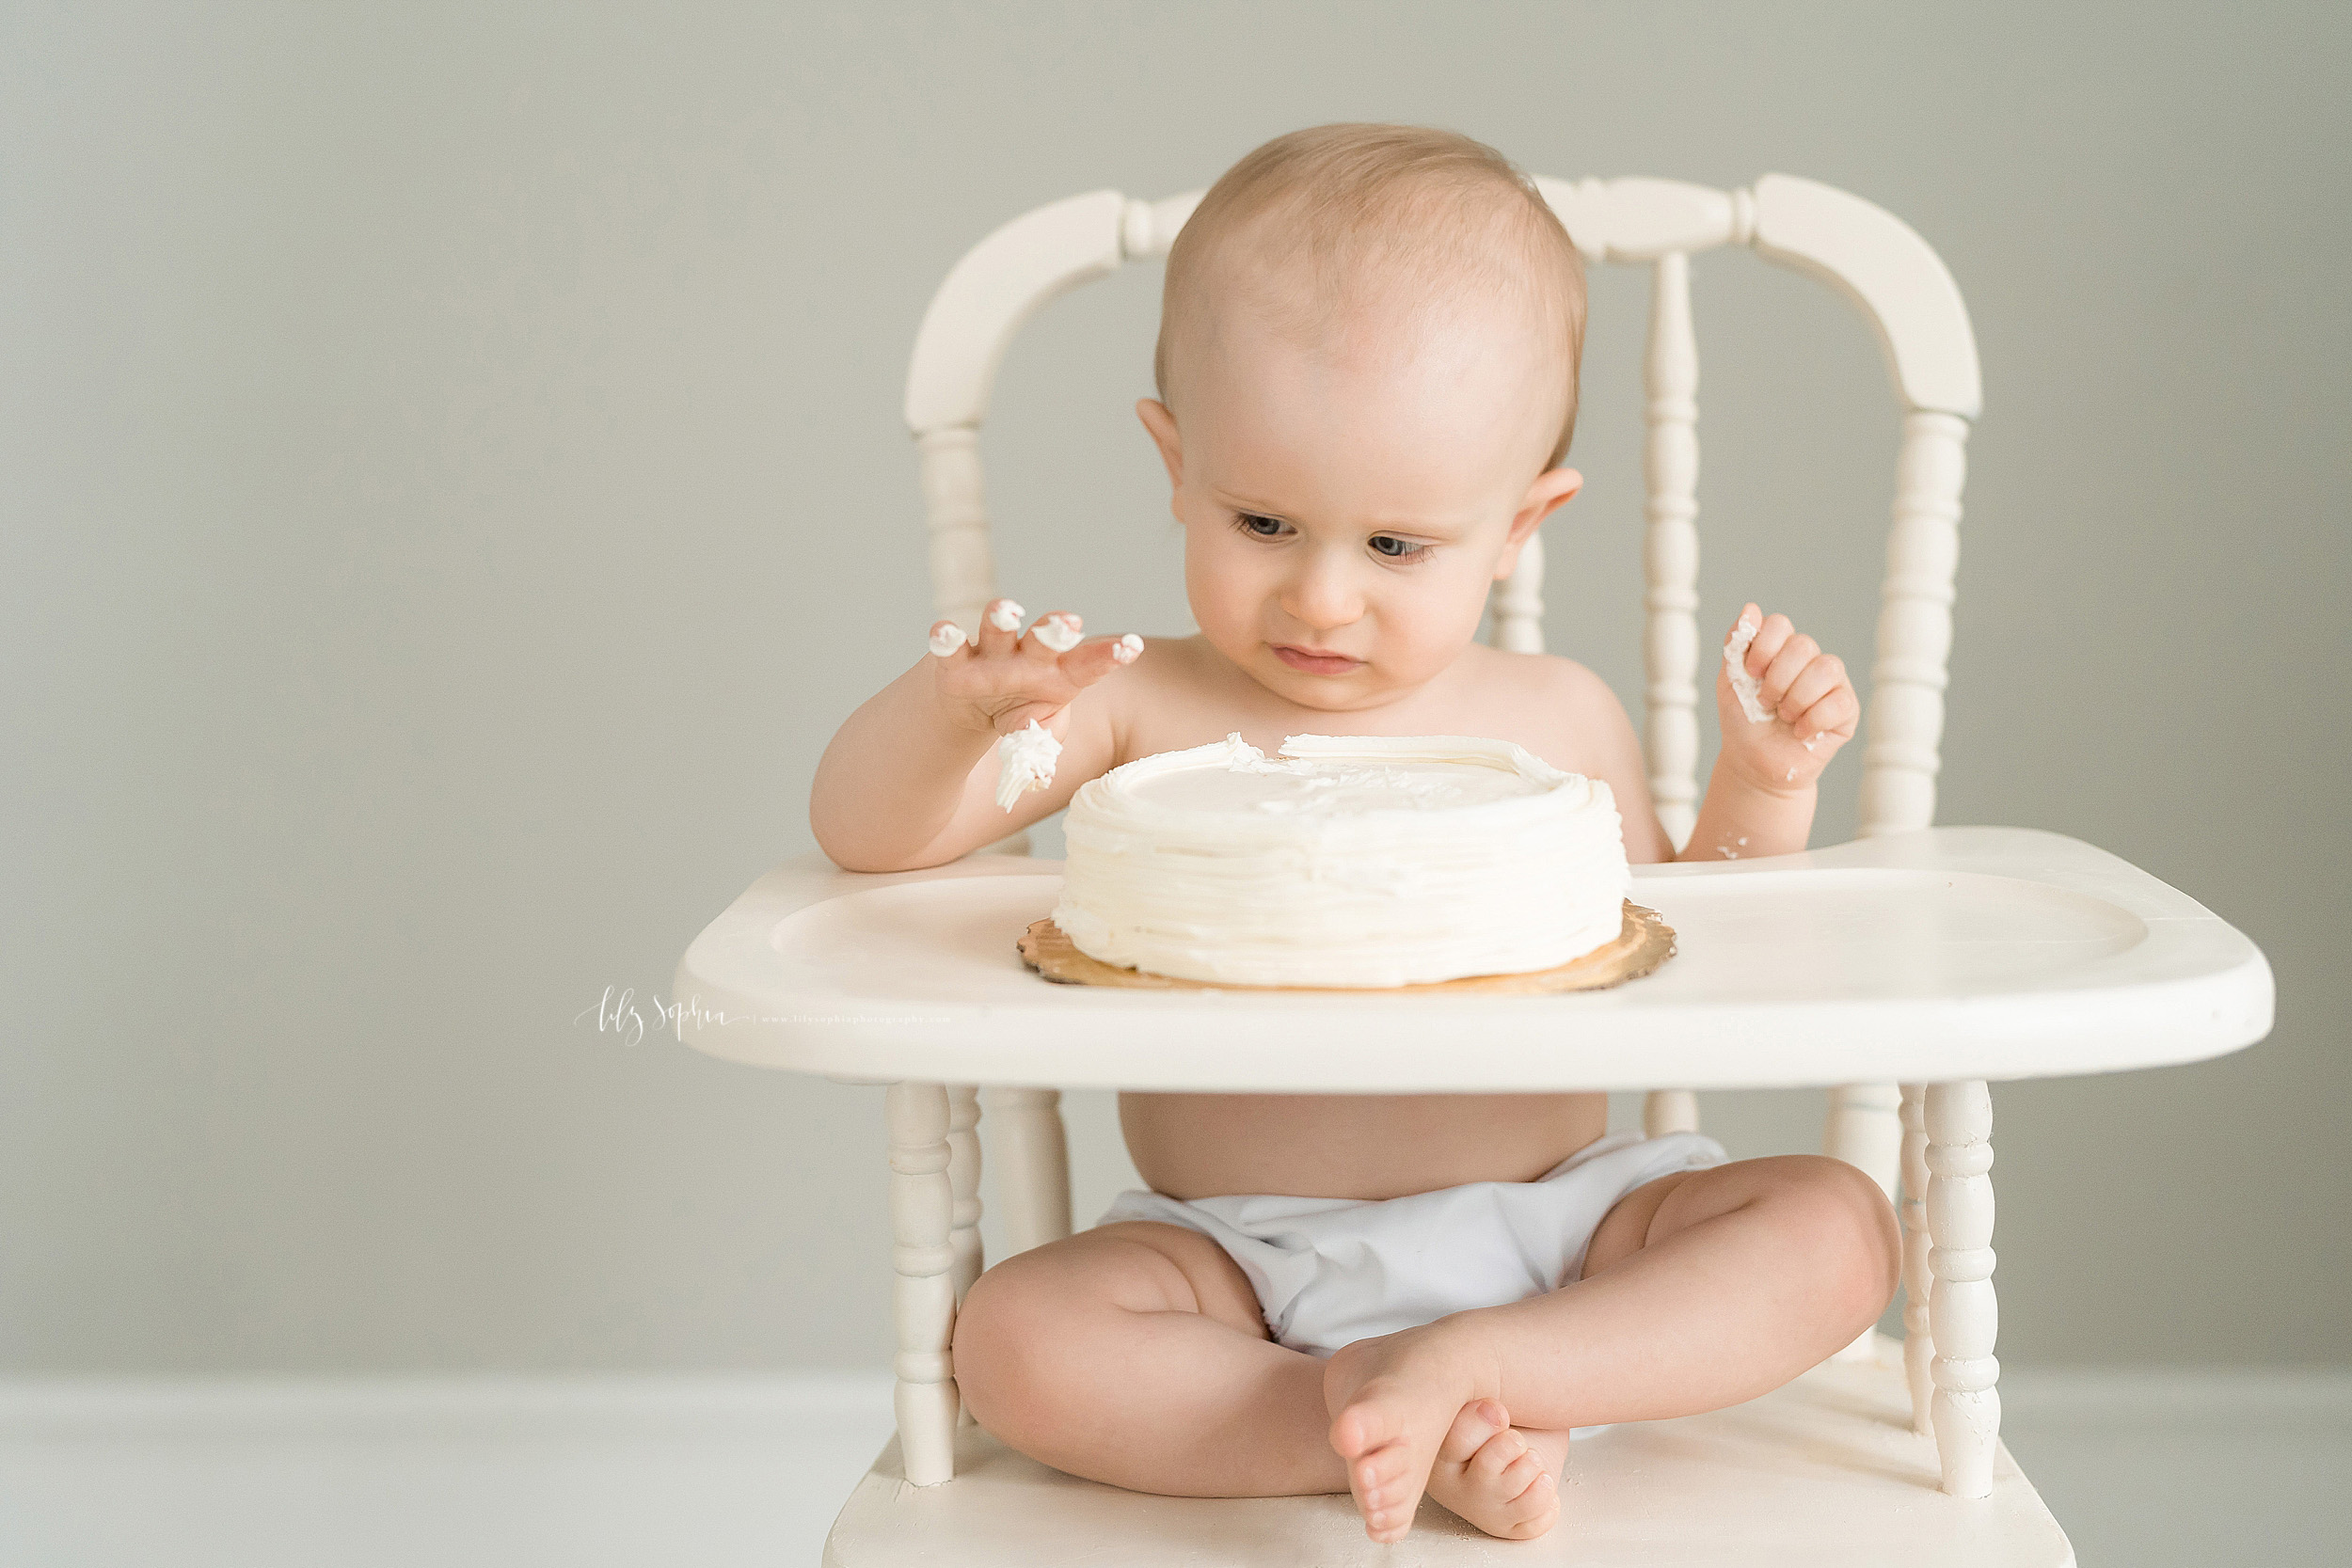 atlanta-brookhaven-alpharetta-sandy-springs-buckhead-virginia-highlands-west-end-decatur-lily-sophia-photography-studio-first-birthday-cake-smash-toddler-baby-boy-family-photos_1145.jpg